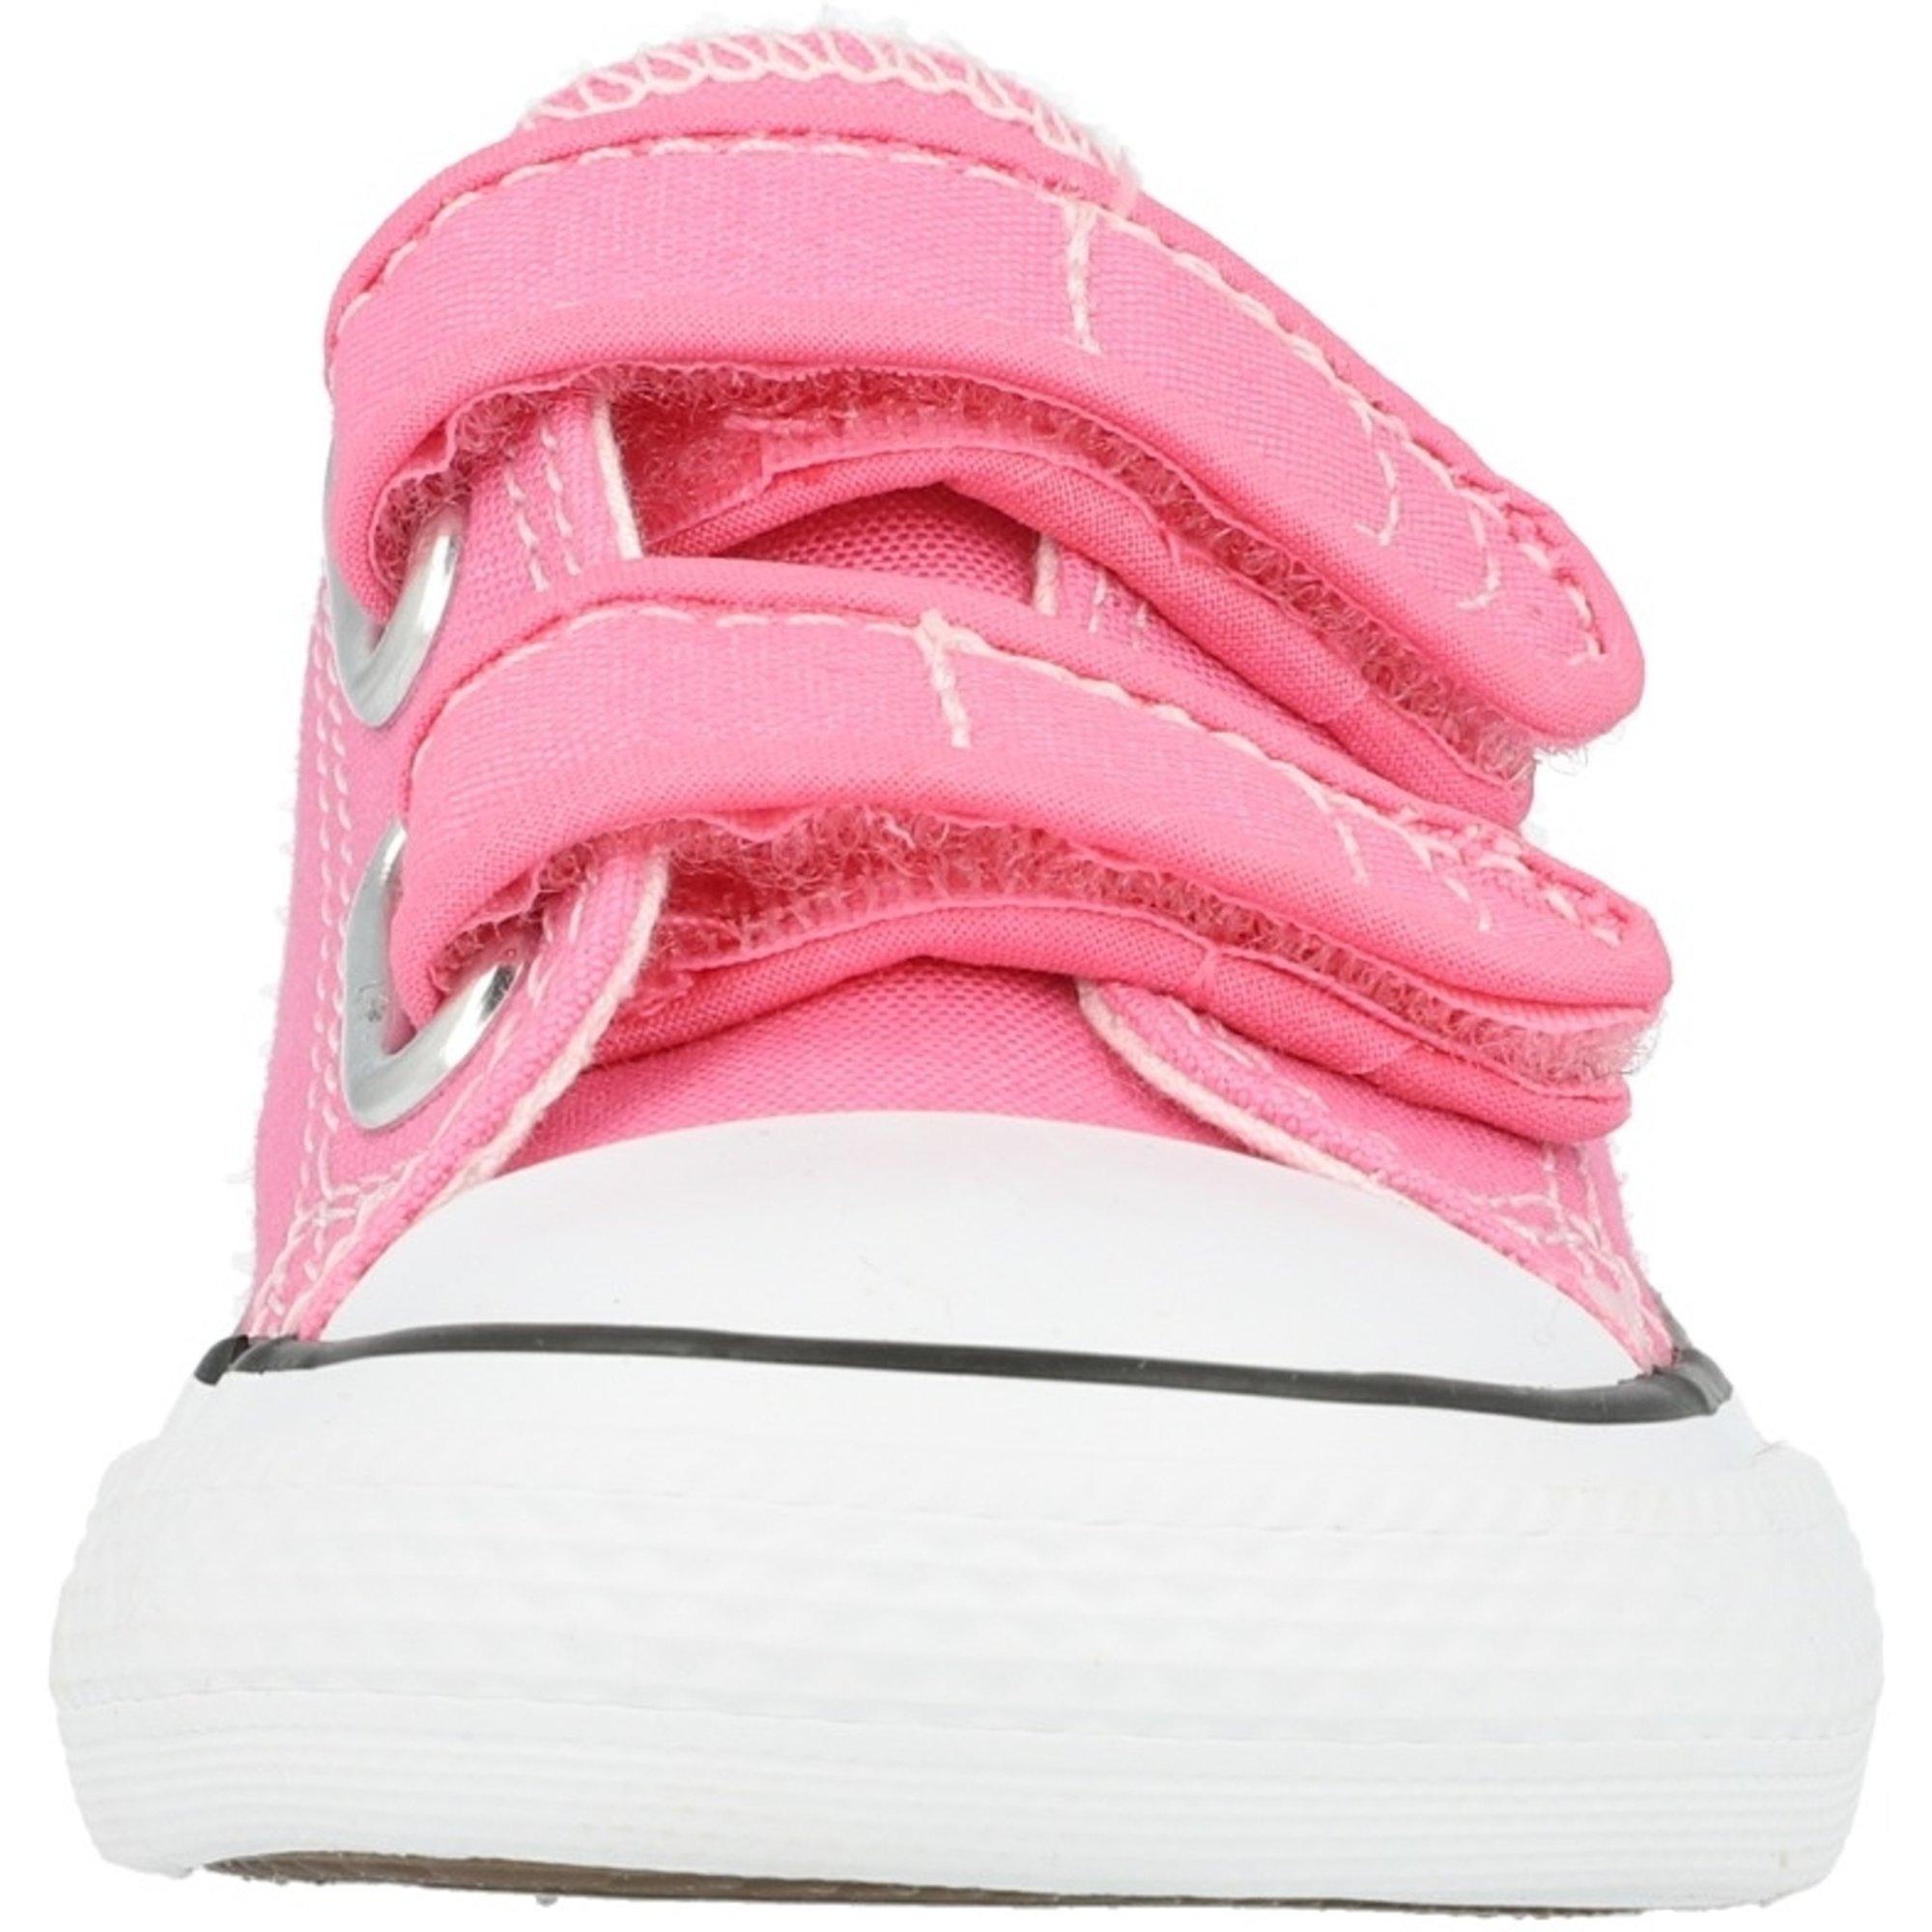 Converse Chuck Taylor All Star 2V Pink Textile